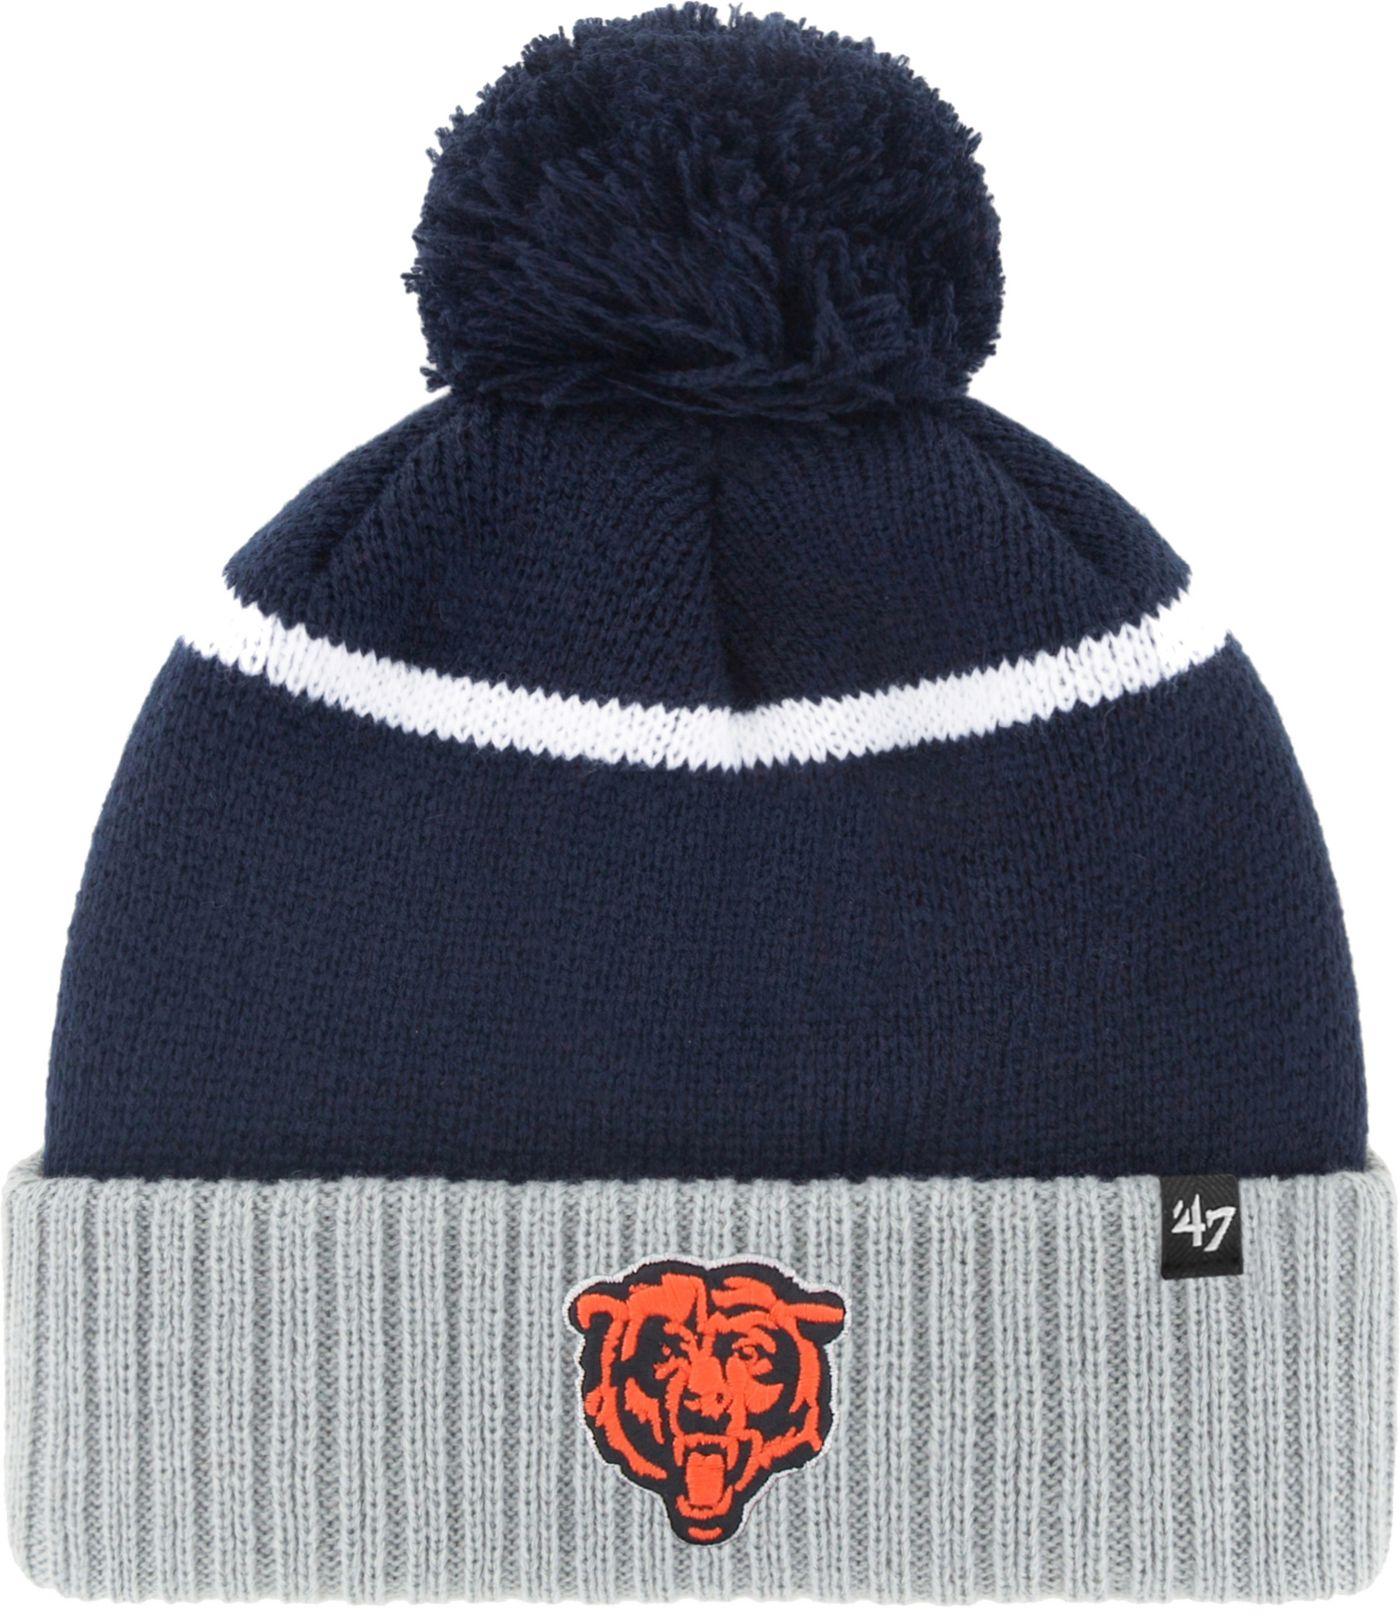 '47 Men's Chicago Bears Chop Block Navy Cuffed Pom Knit